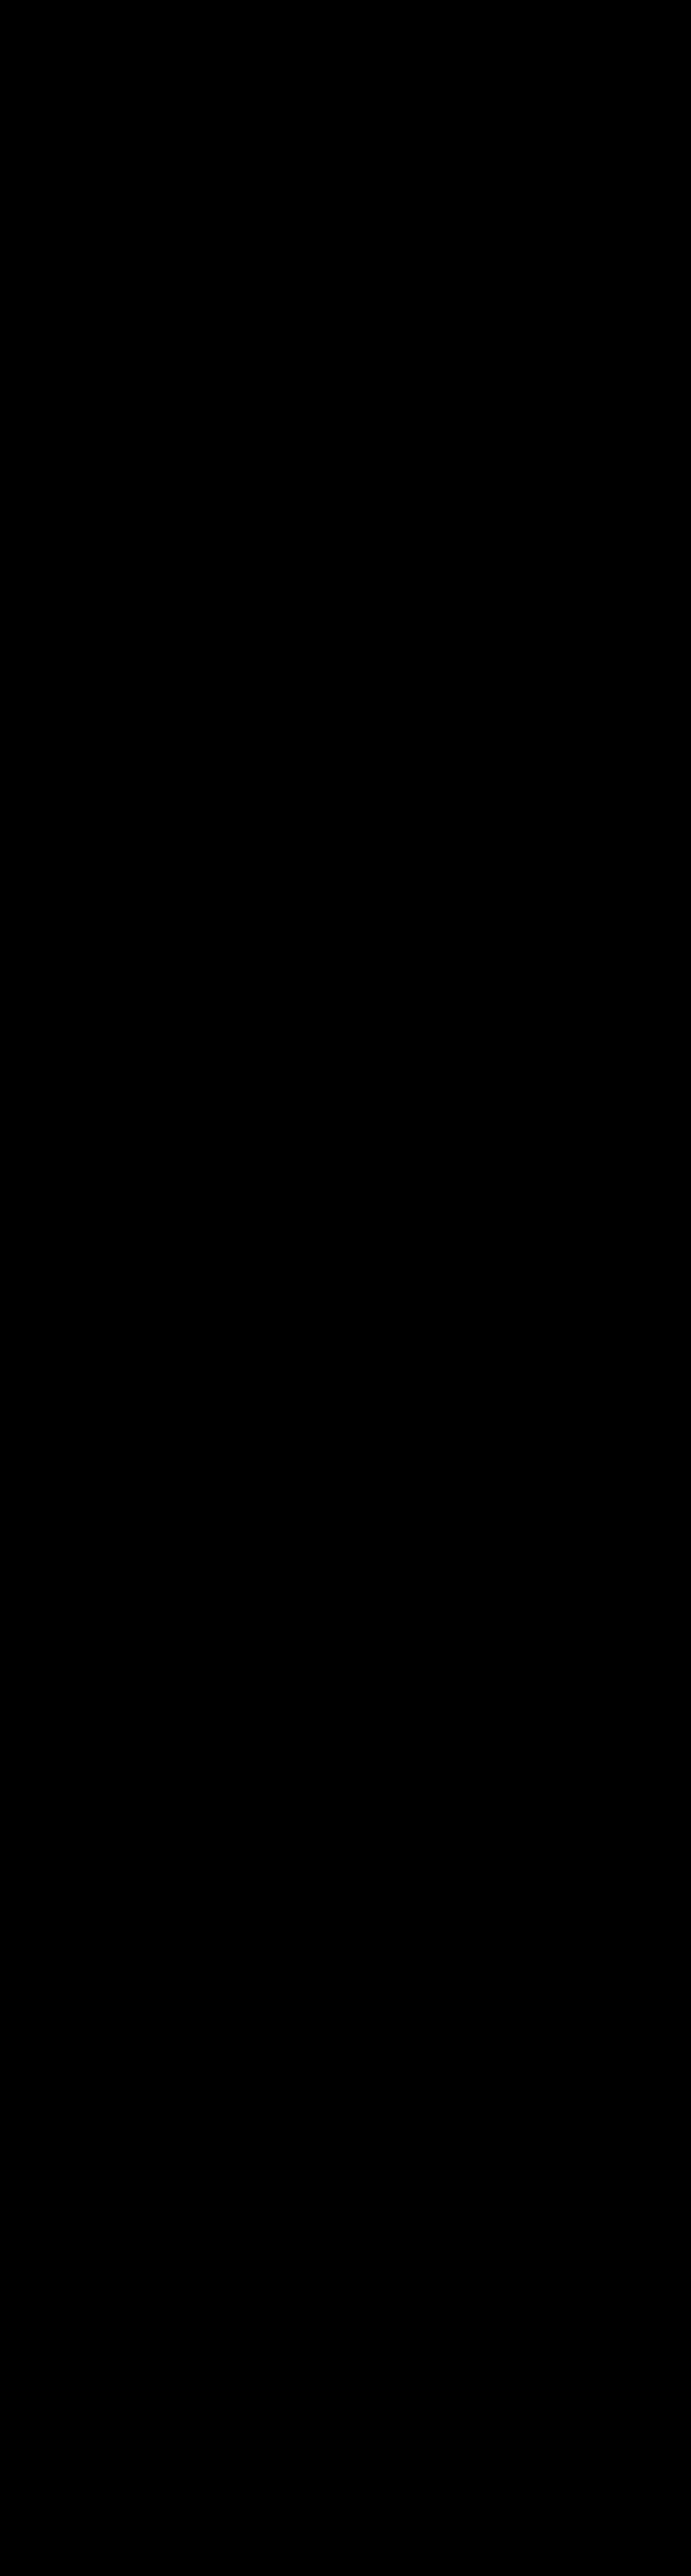 fornasetti atelier